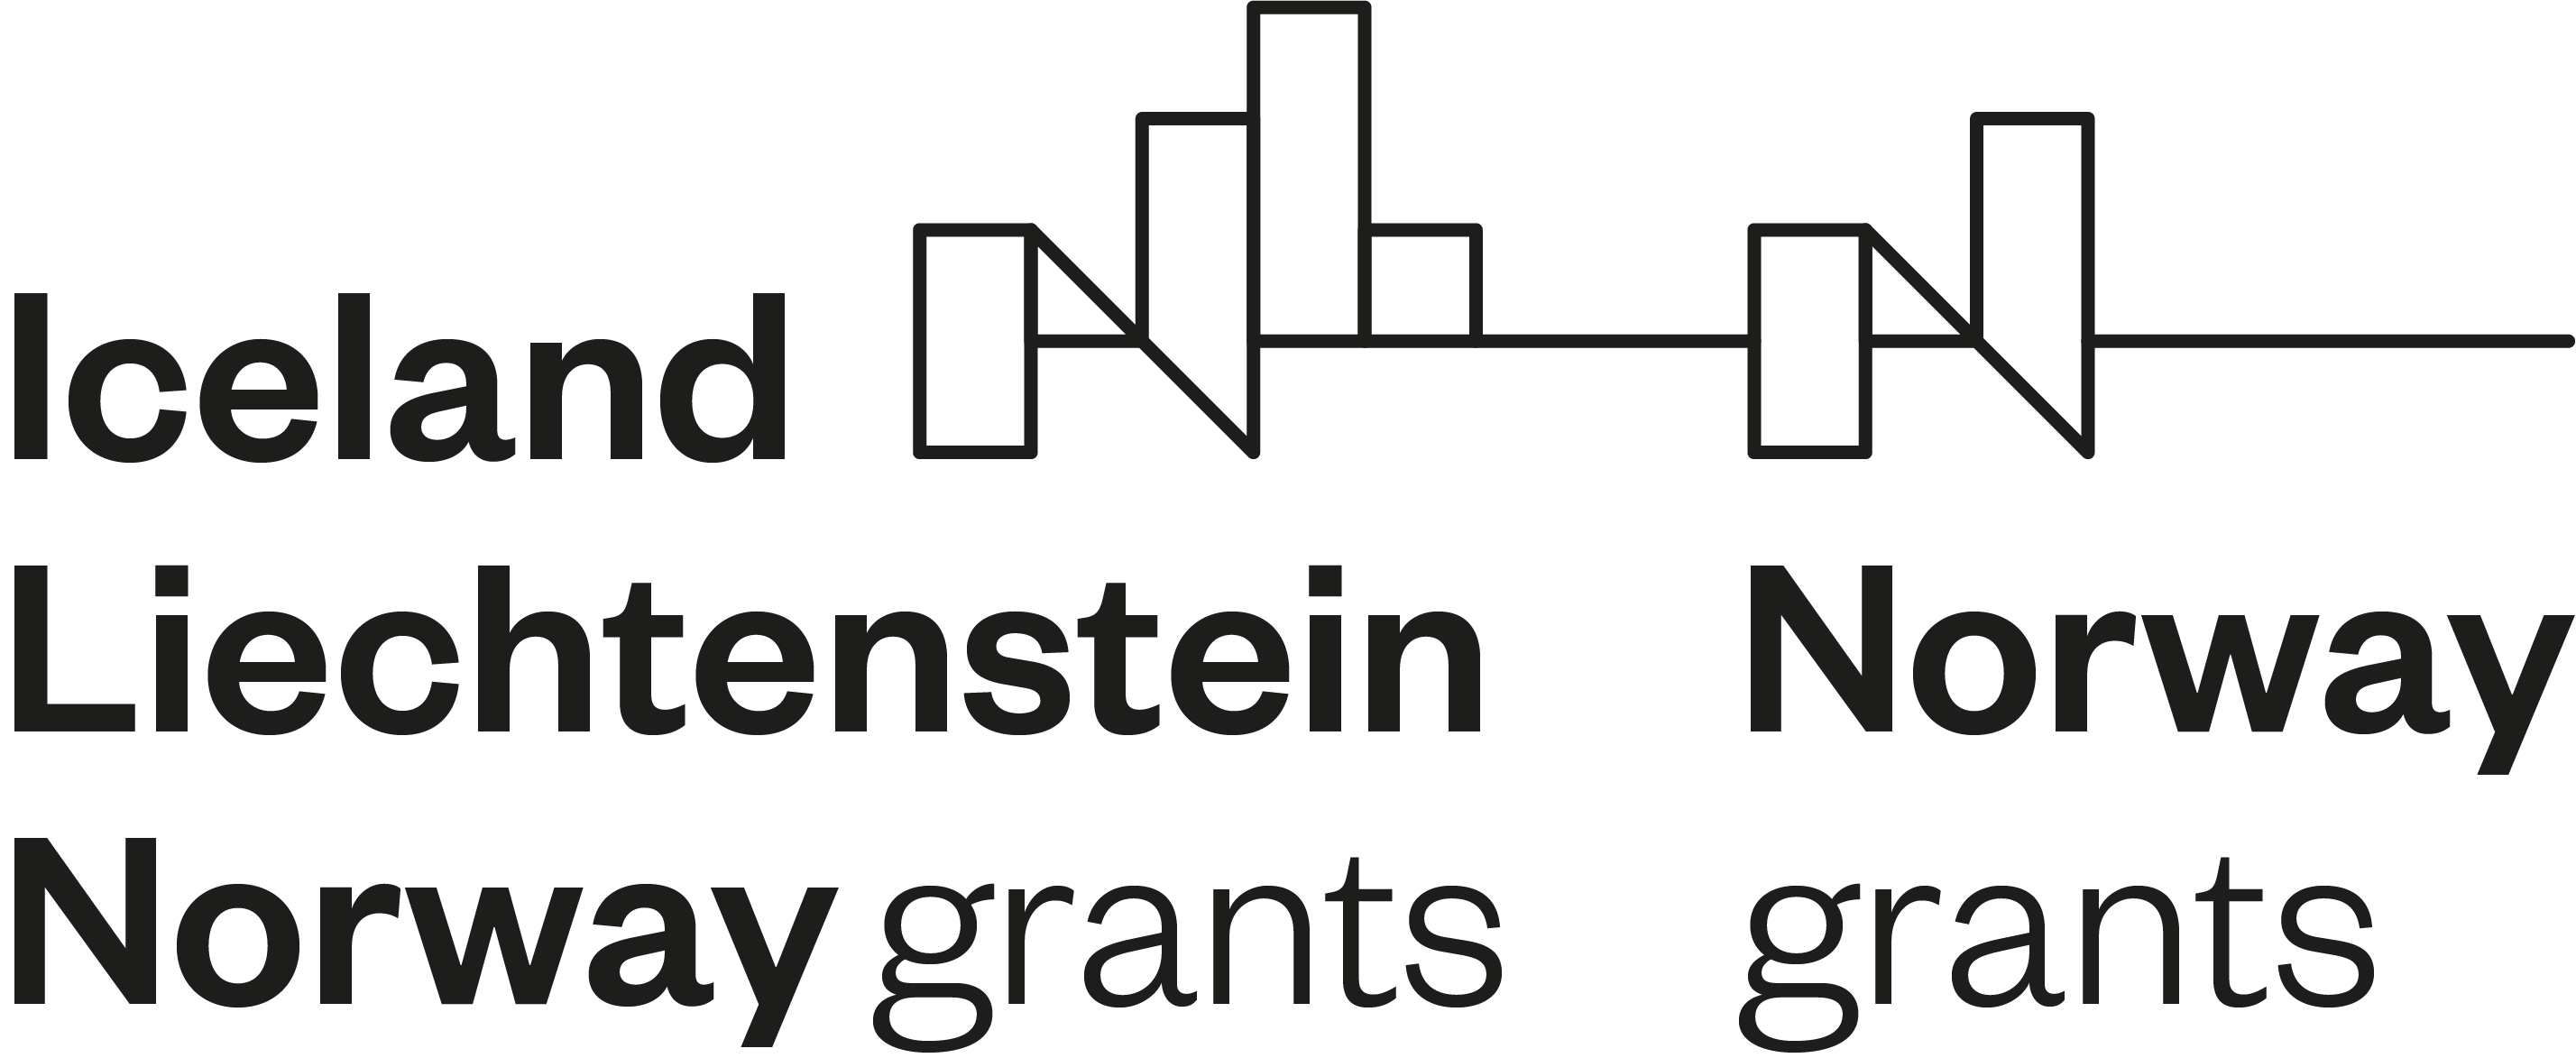 EEA-and-Norway_grants4x4